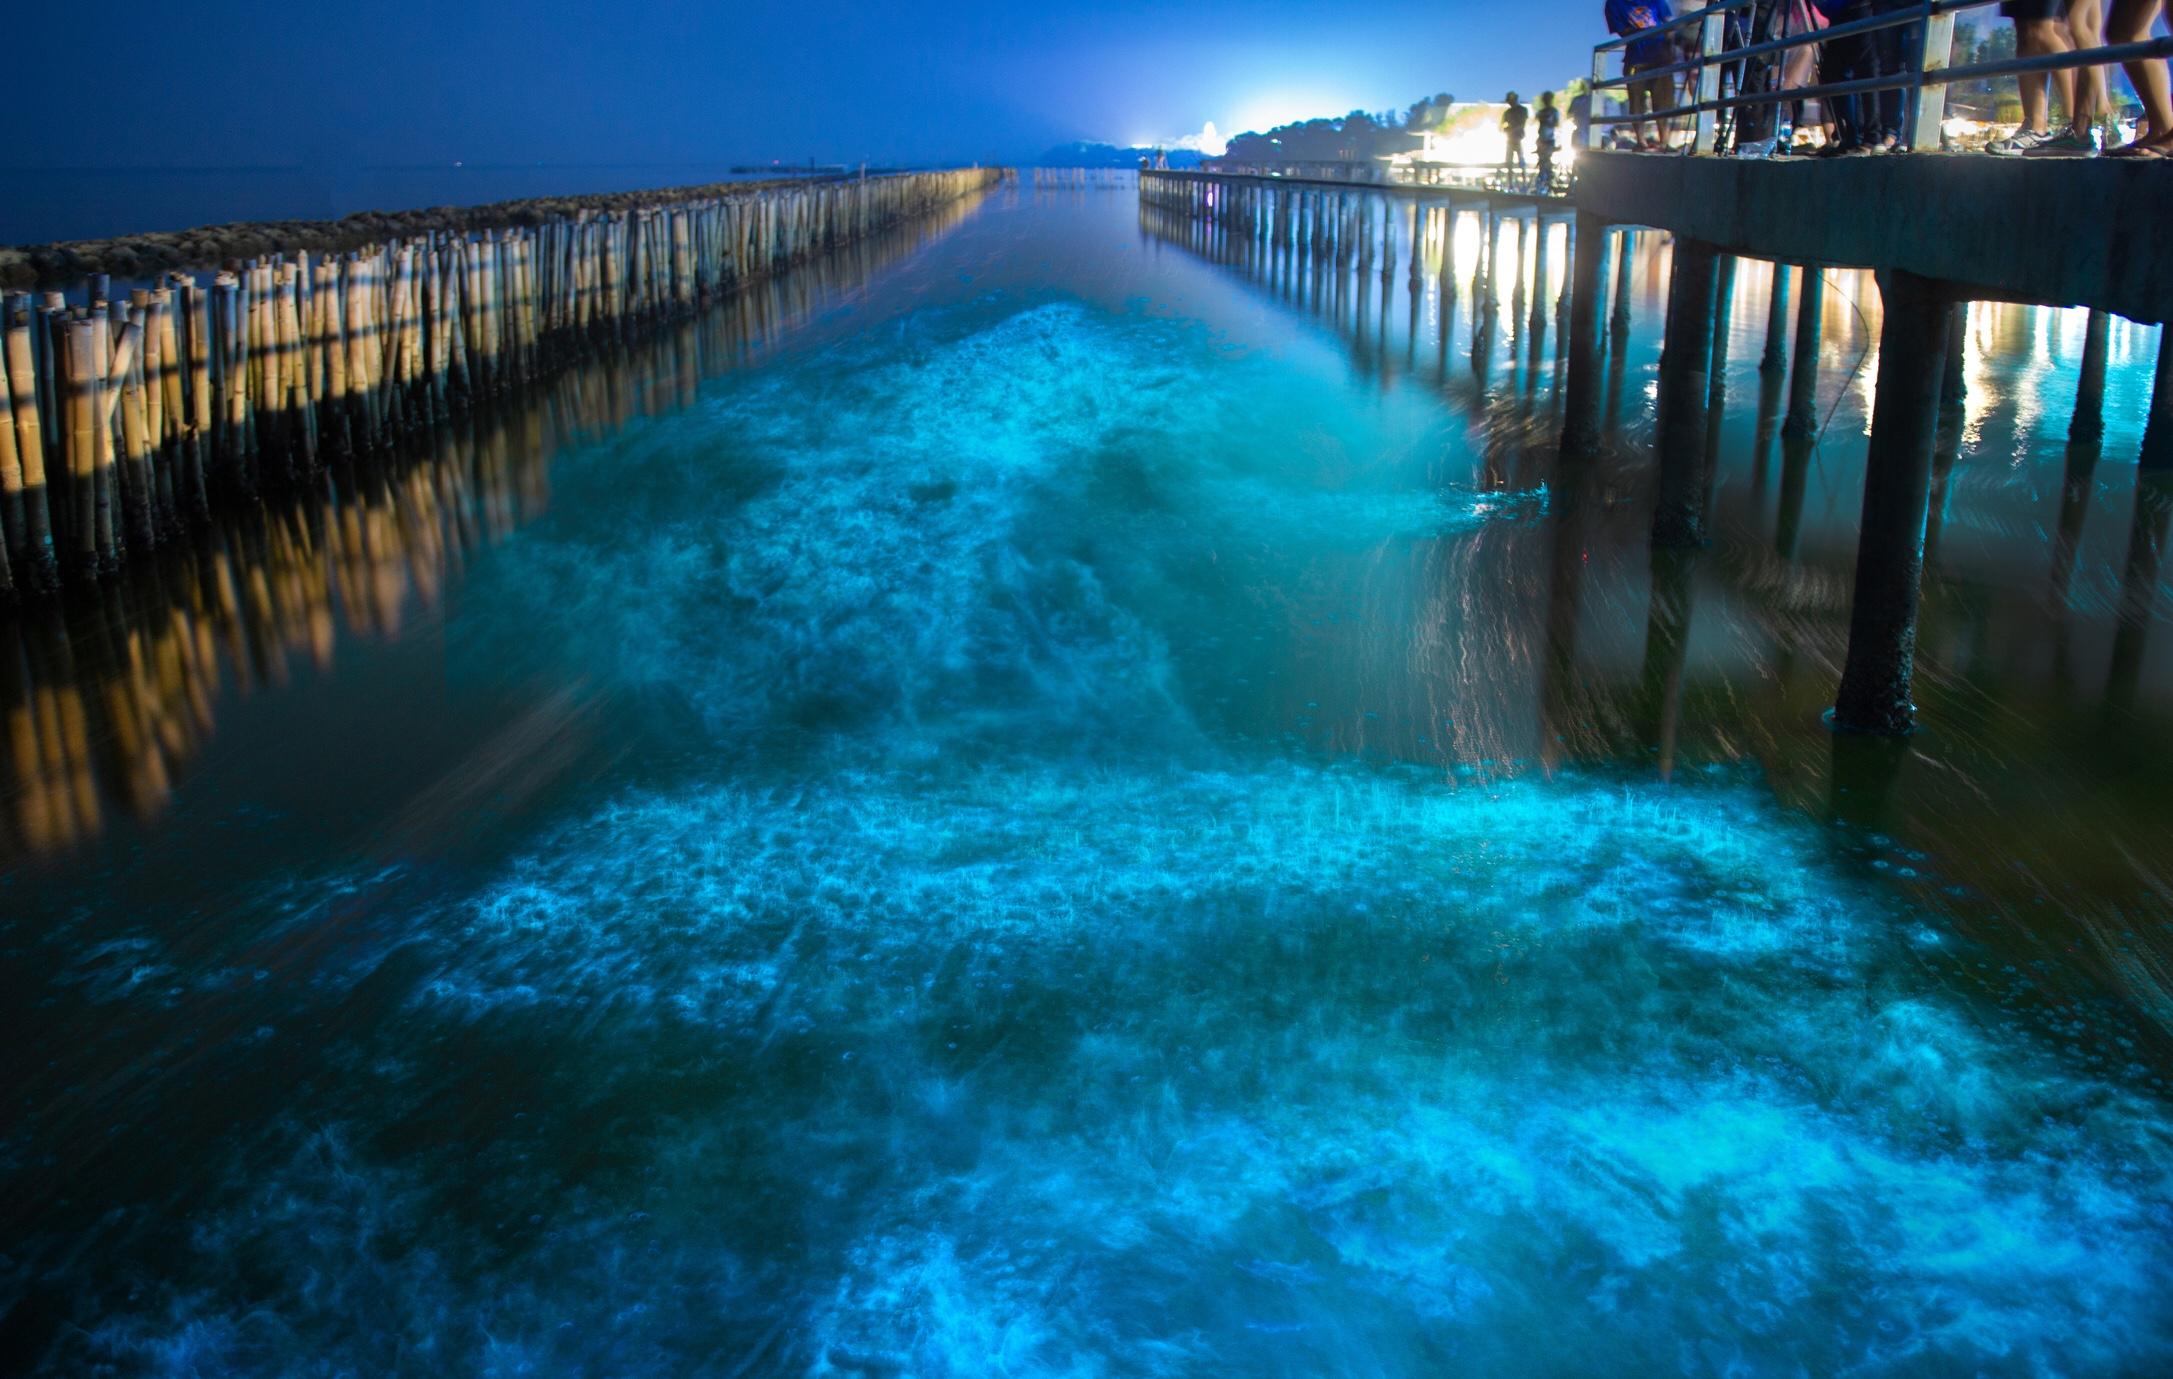 Bioluminescence in the ocean, iStock